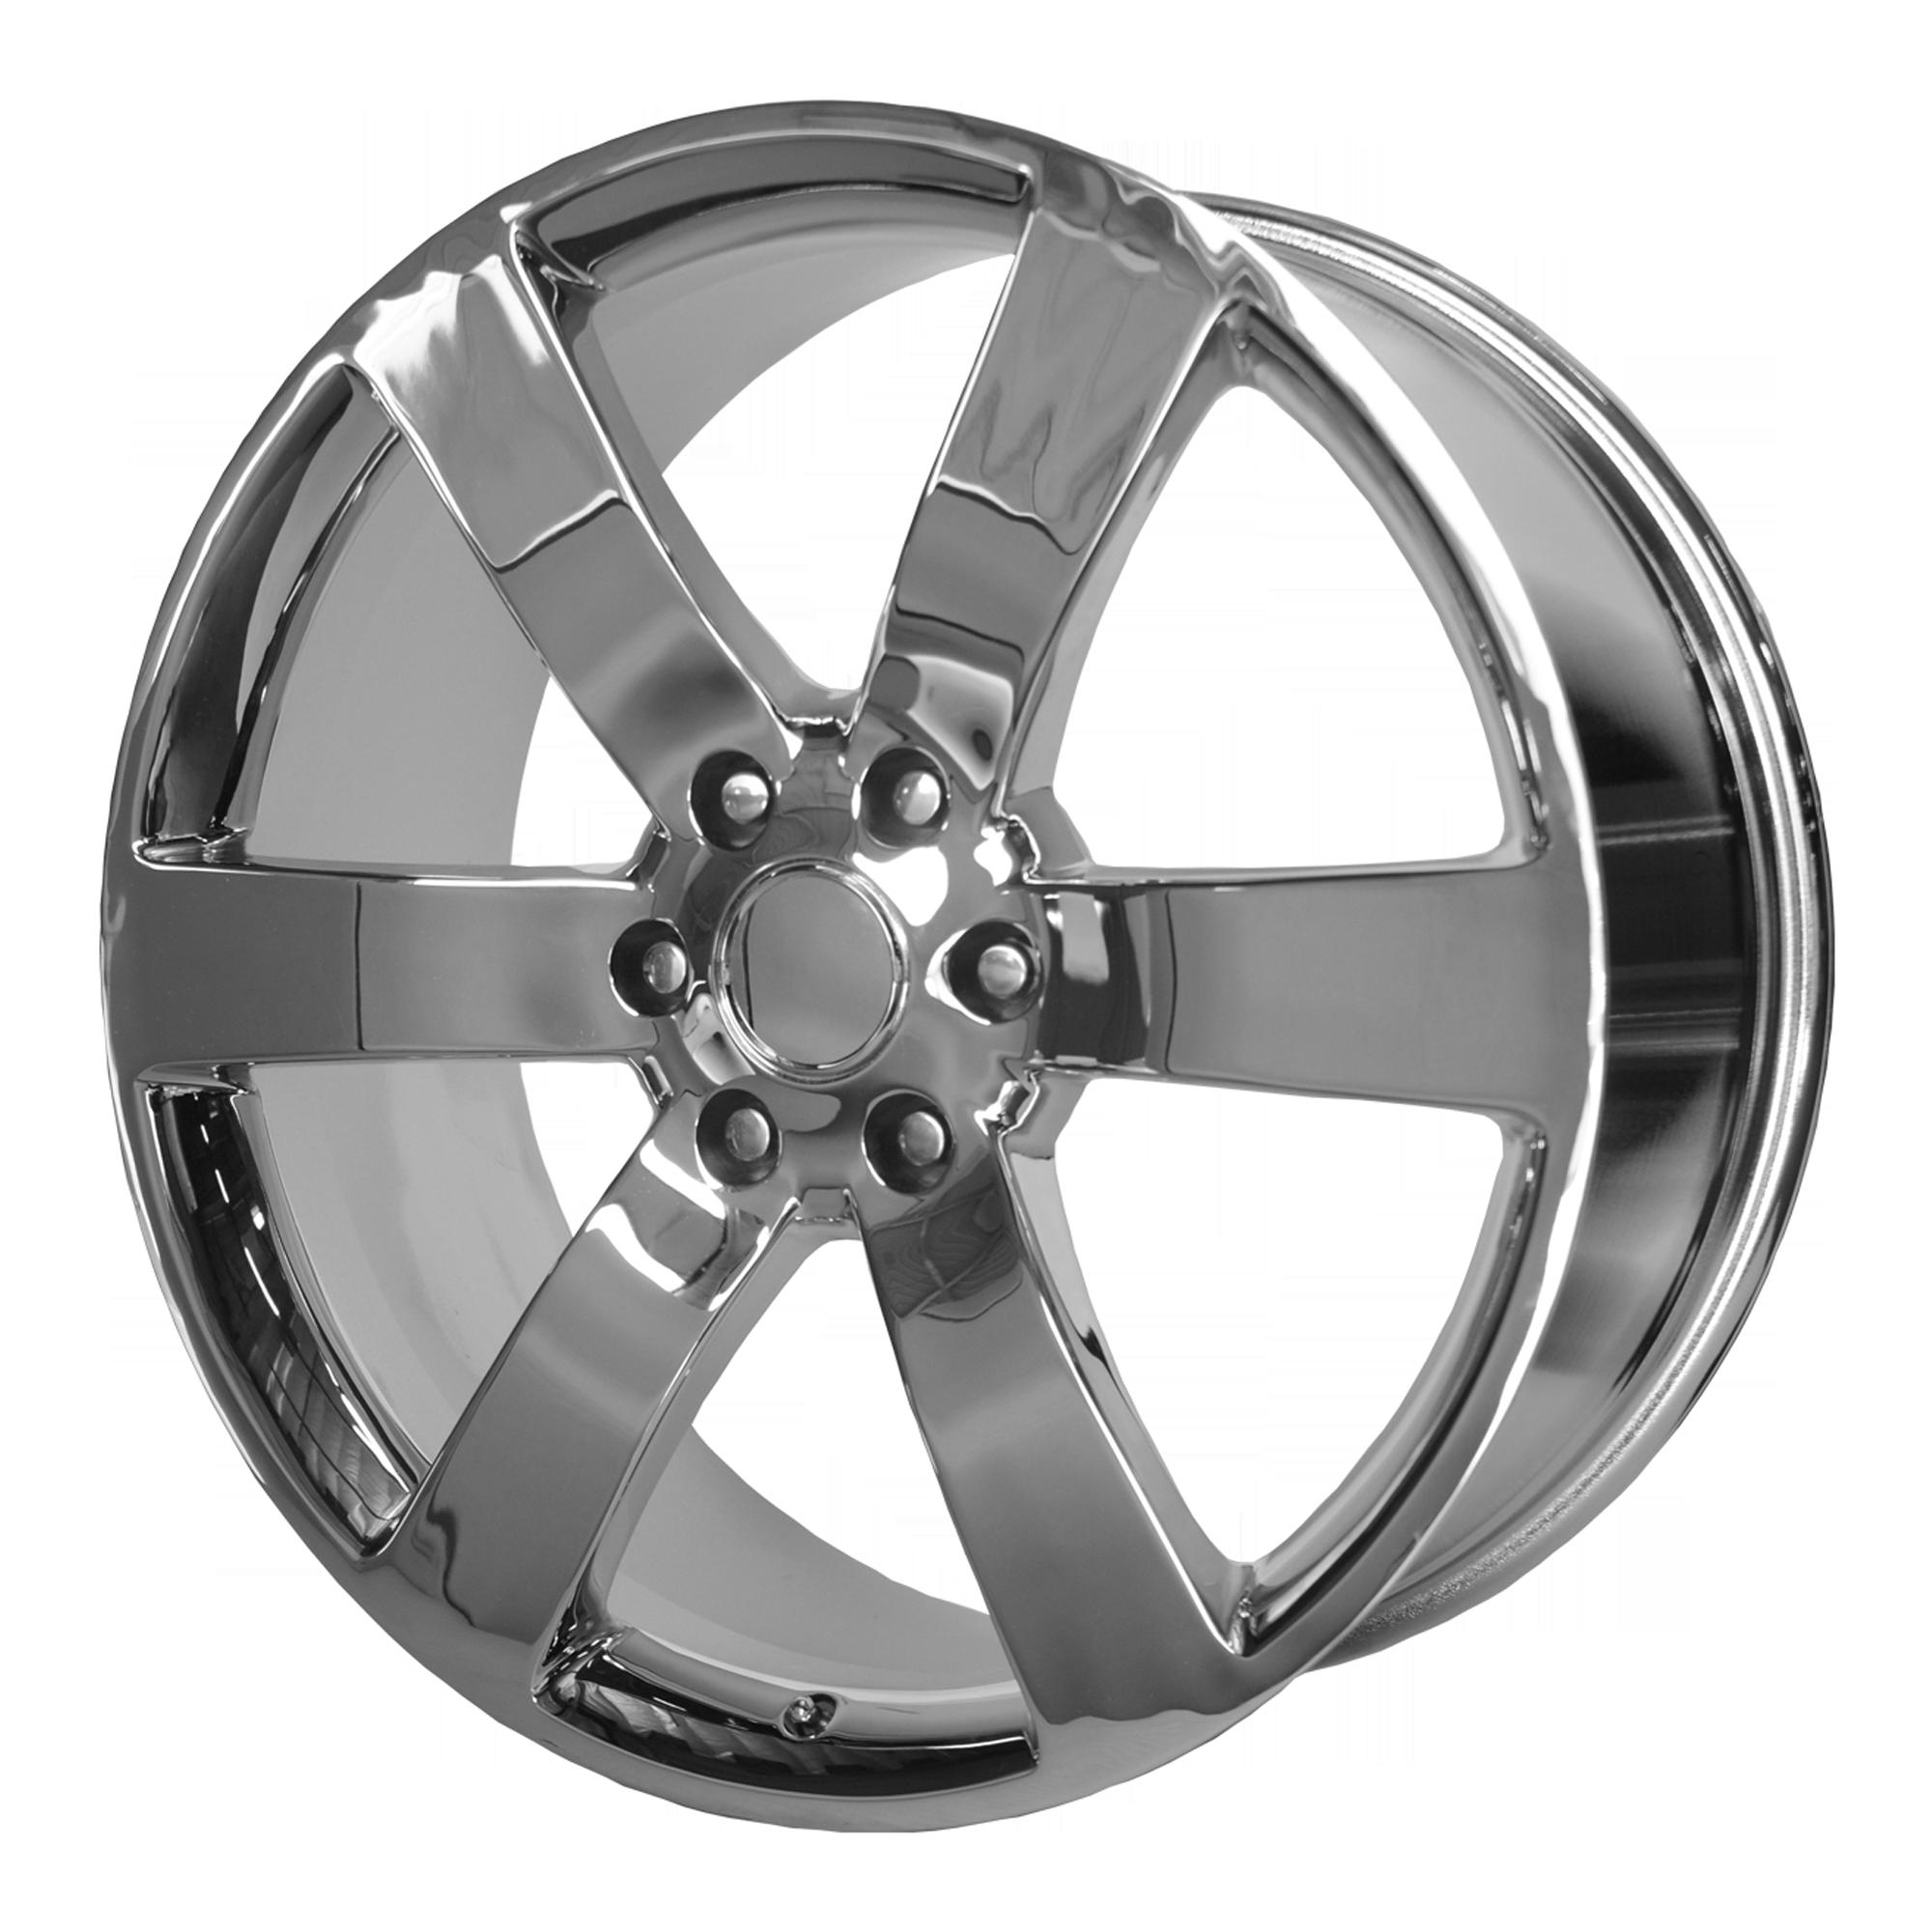 OE Creations Replica Wheels OE Creations PR165 Chrome